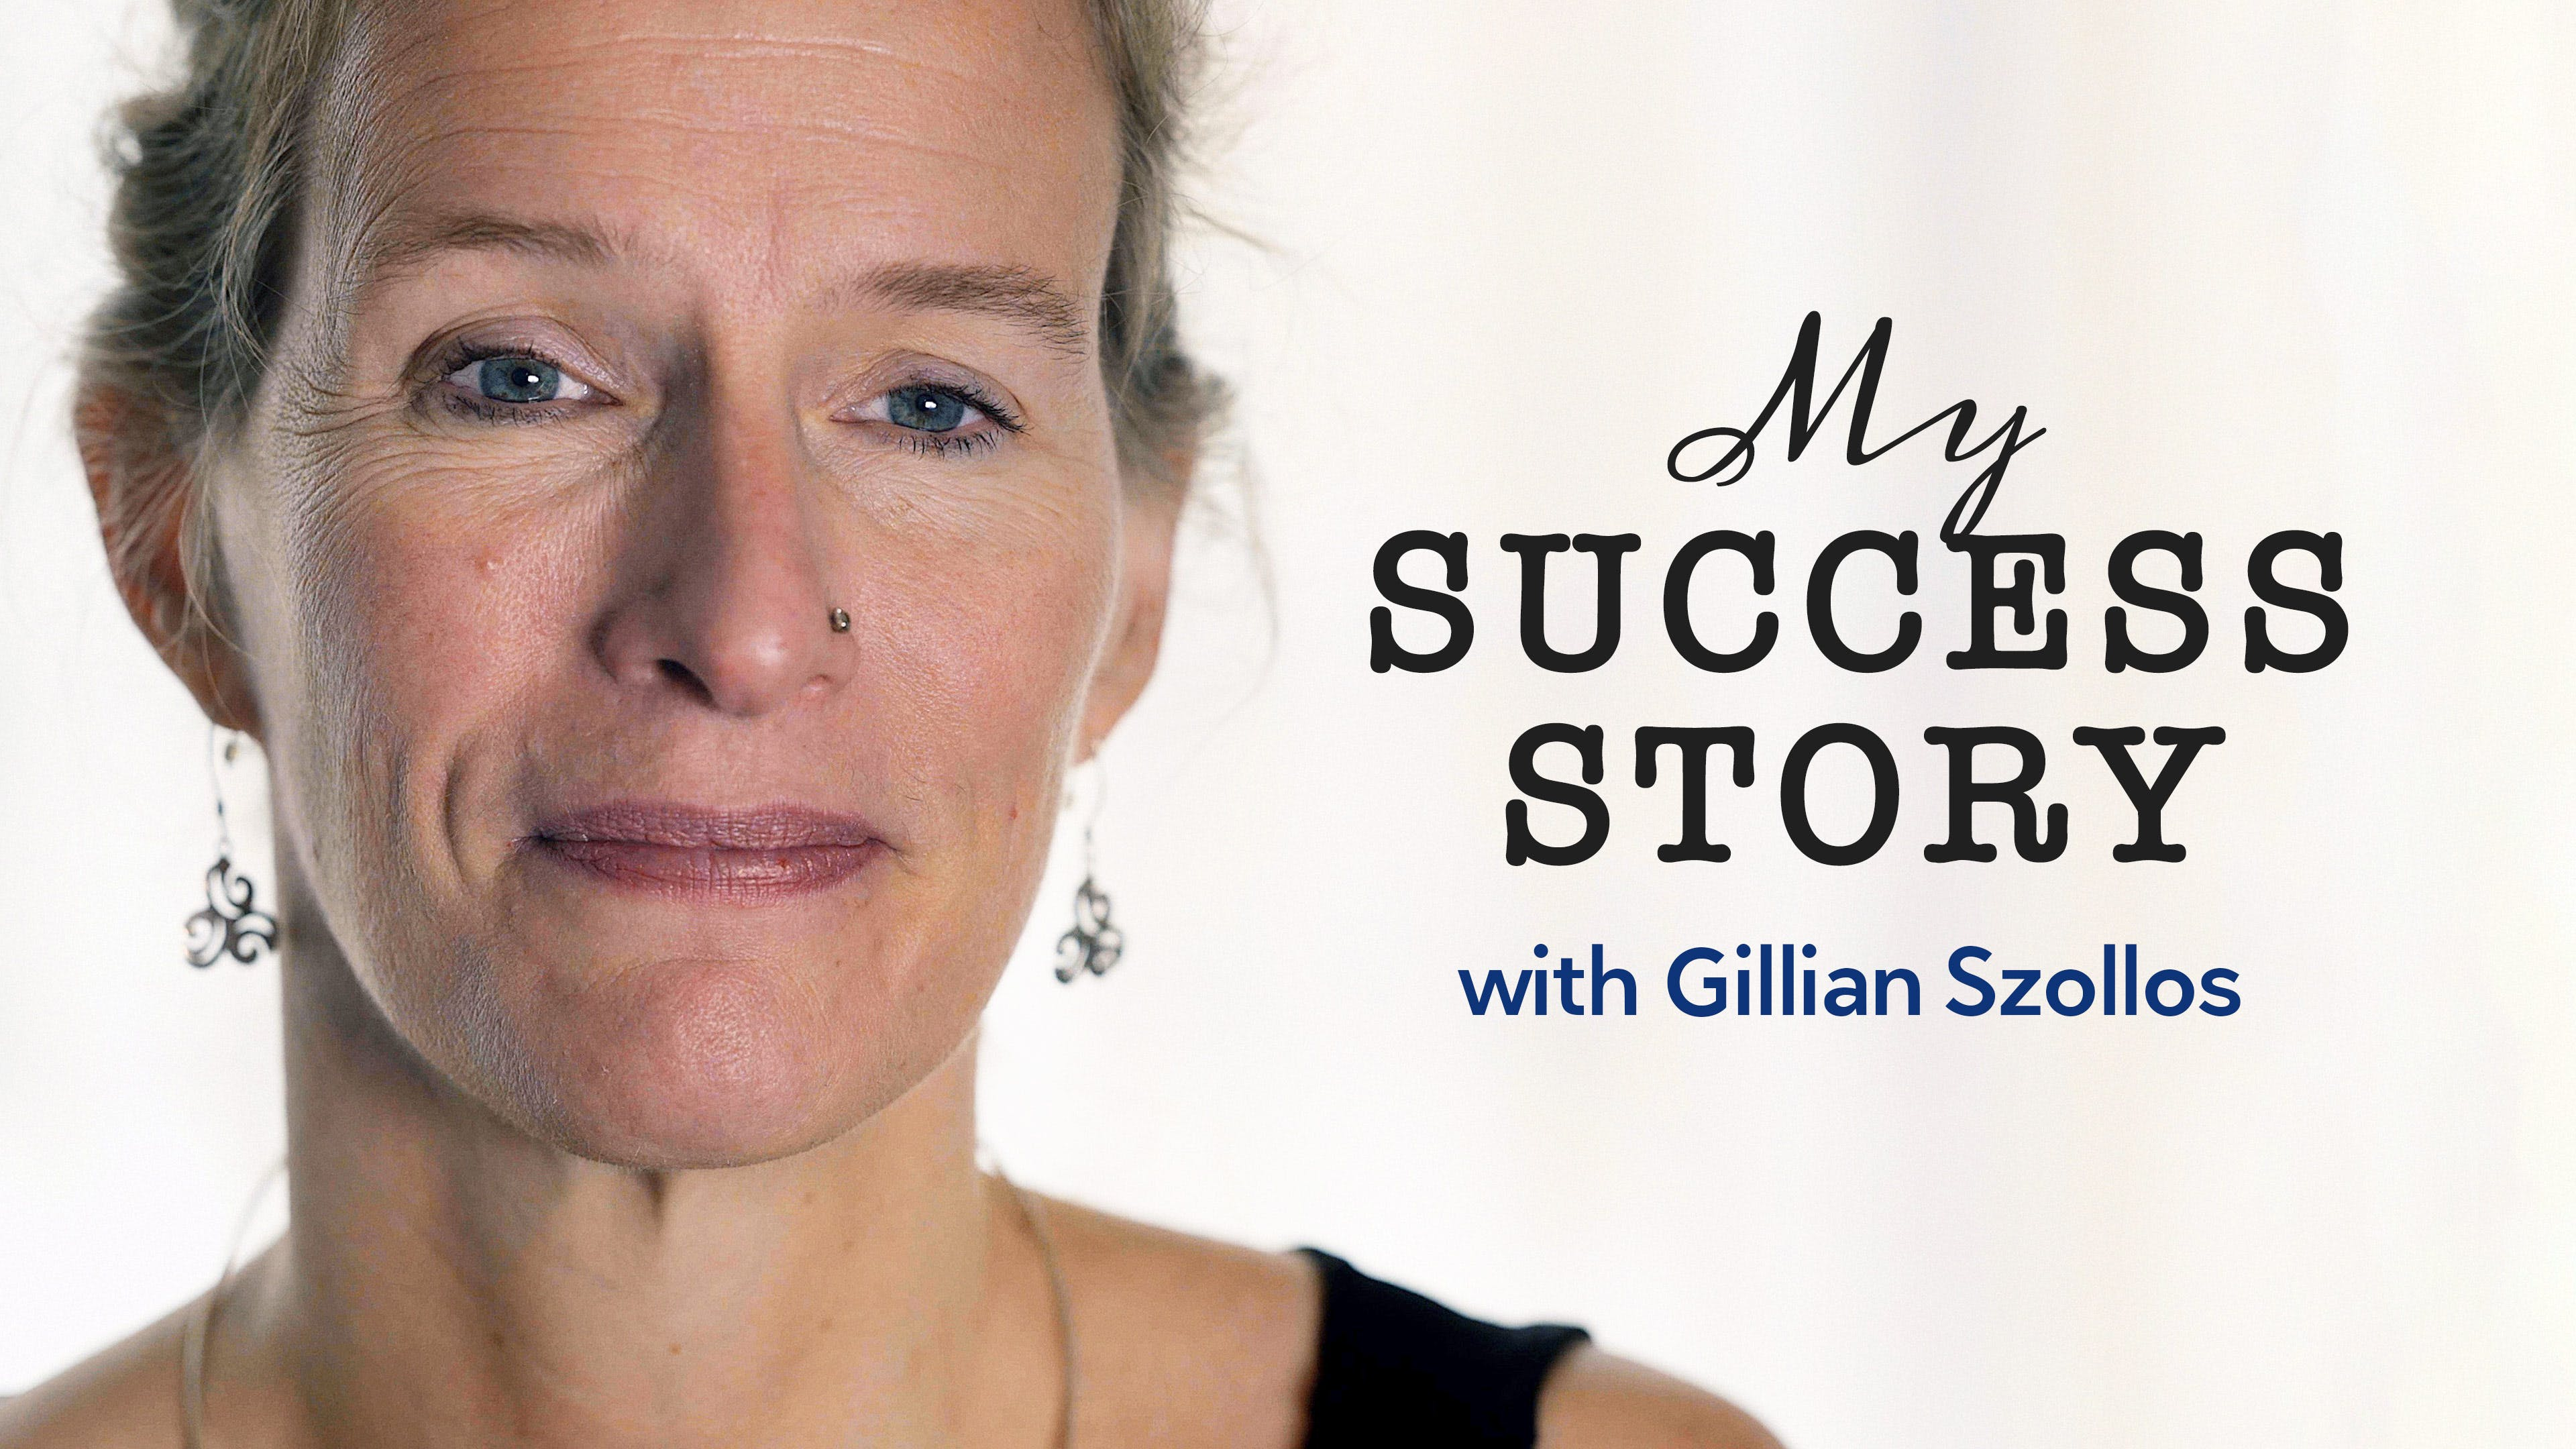 My success story with Gillian Szollos